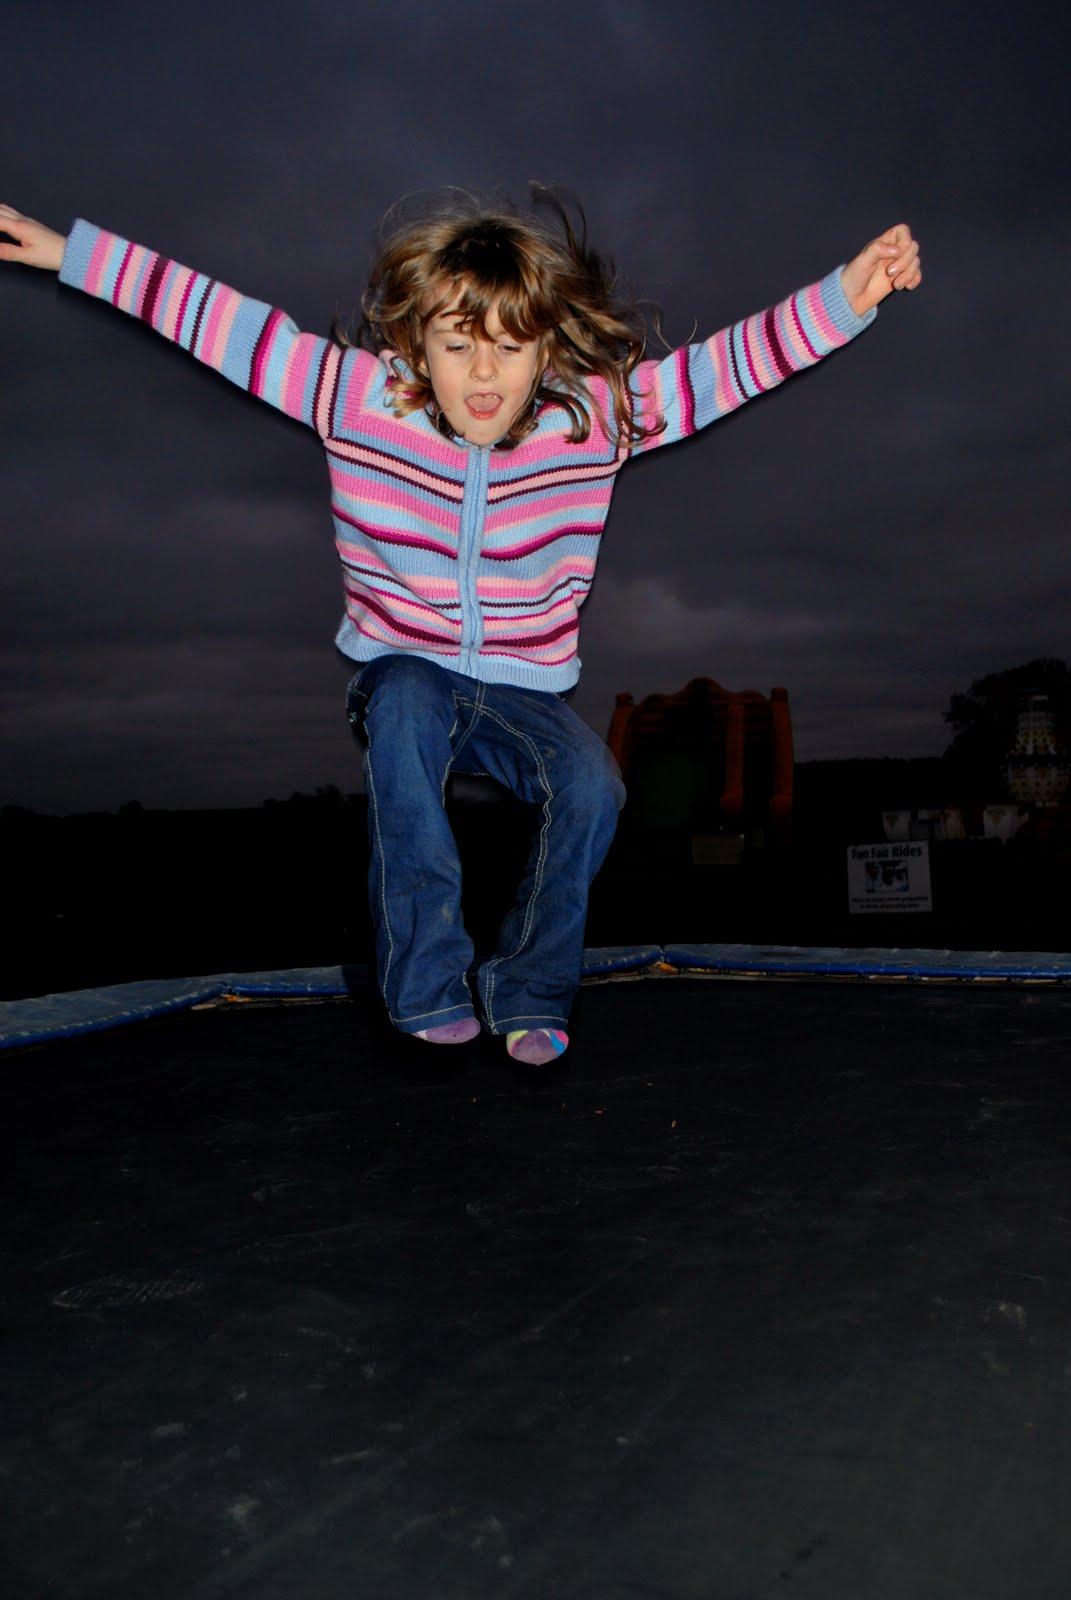 Charlotte on trampoline